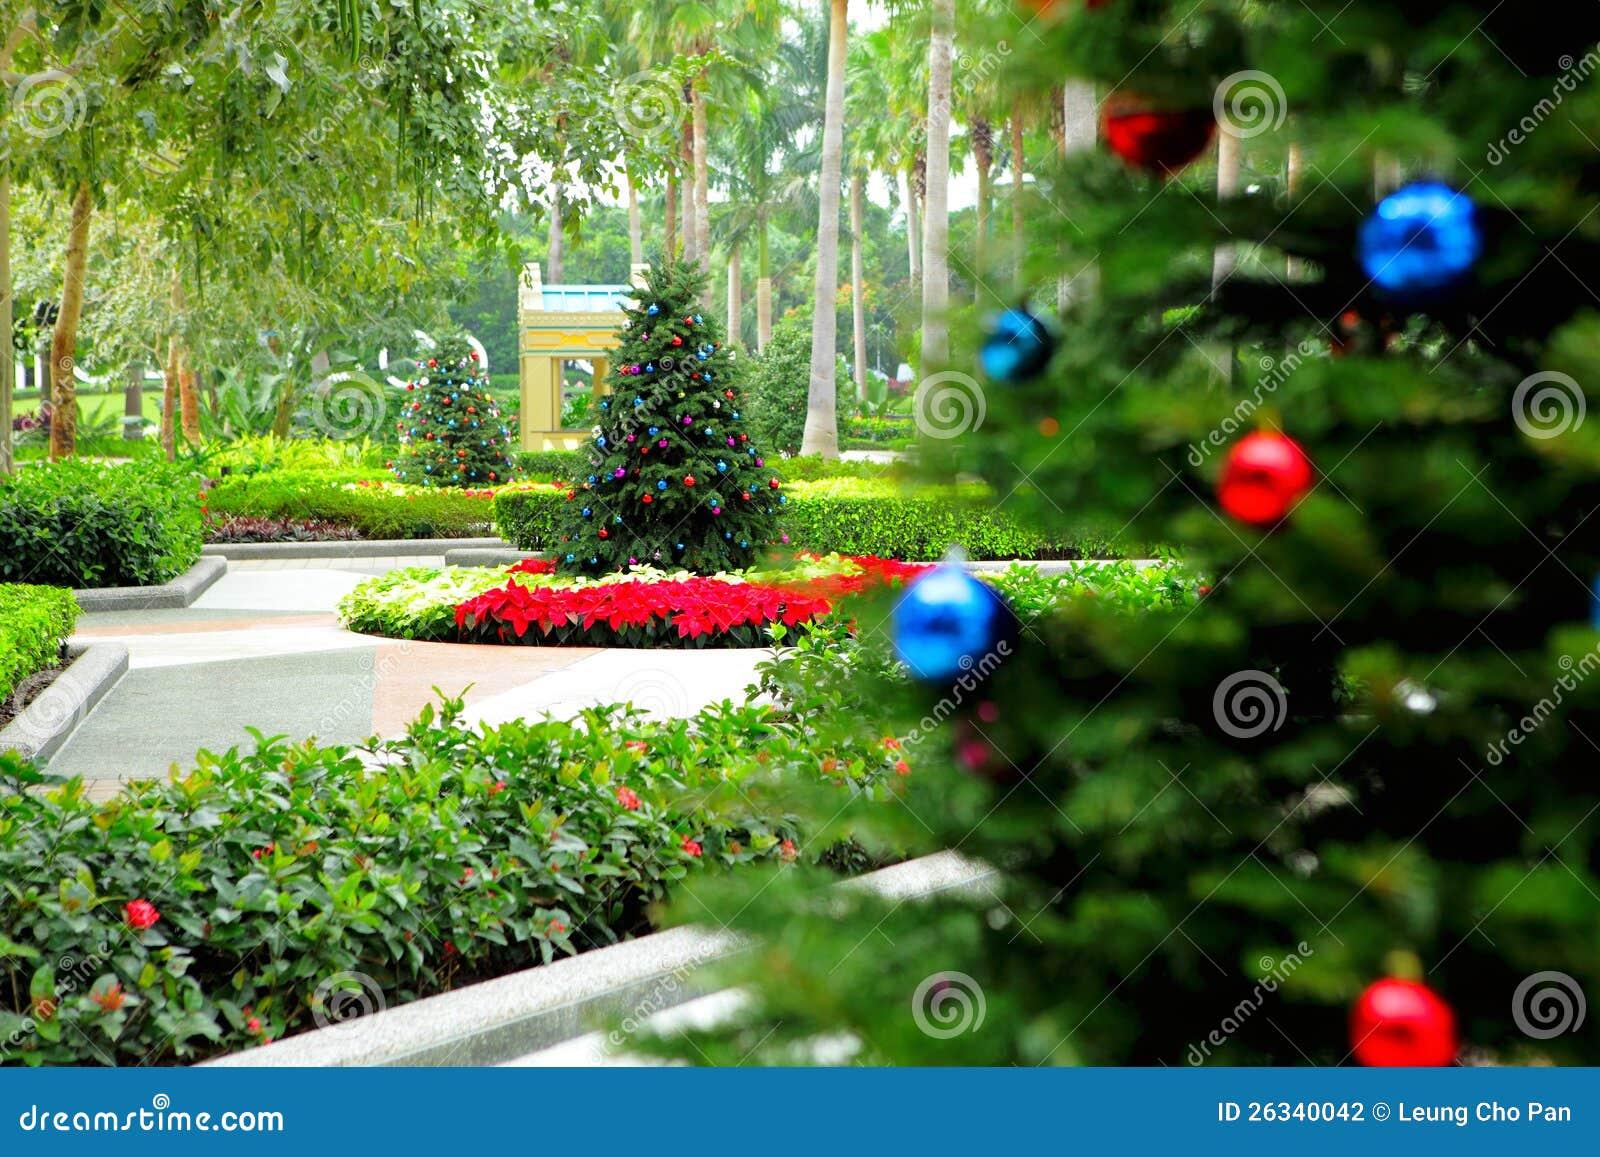 Christmas tree in garden stock photo image of decoration for Garden trees photos